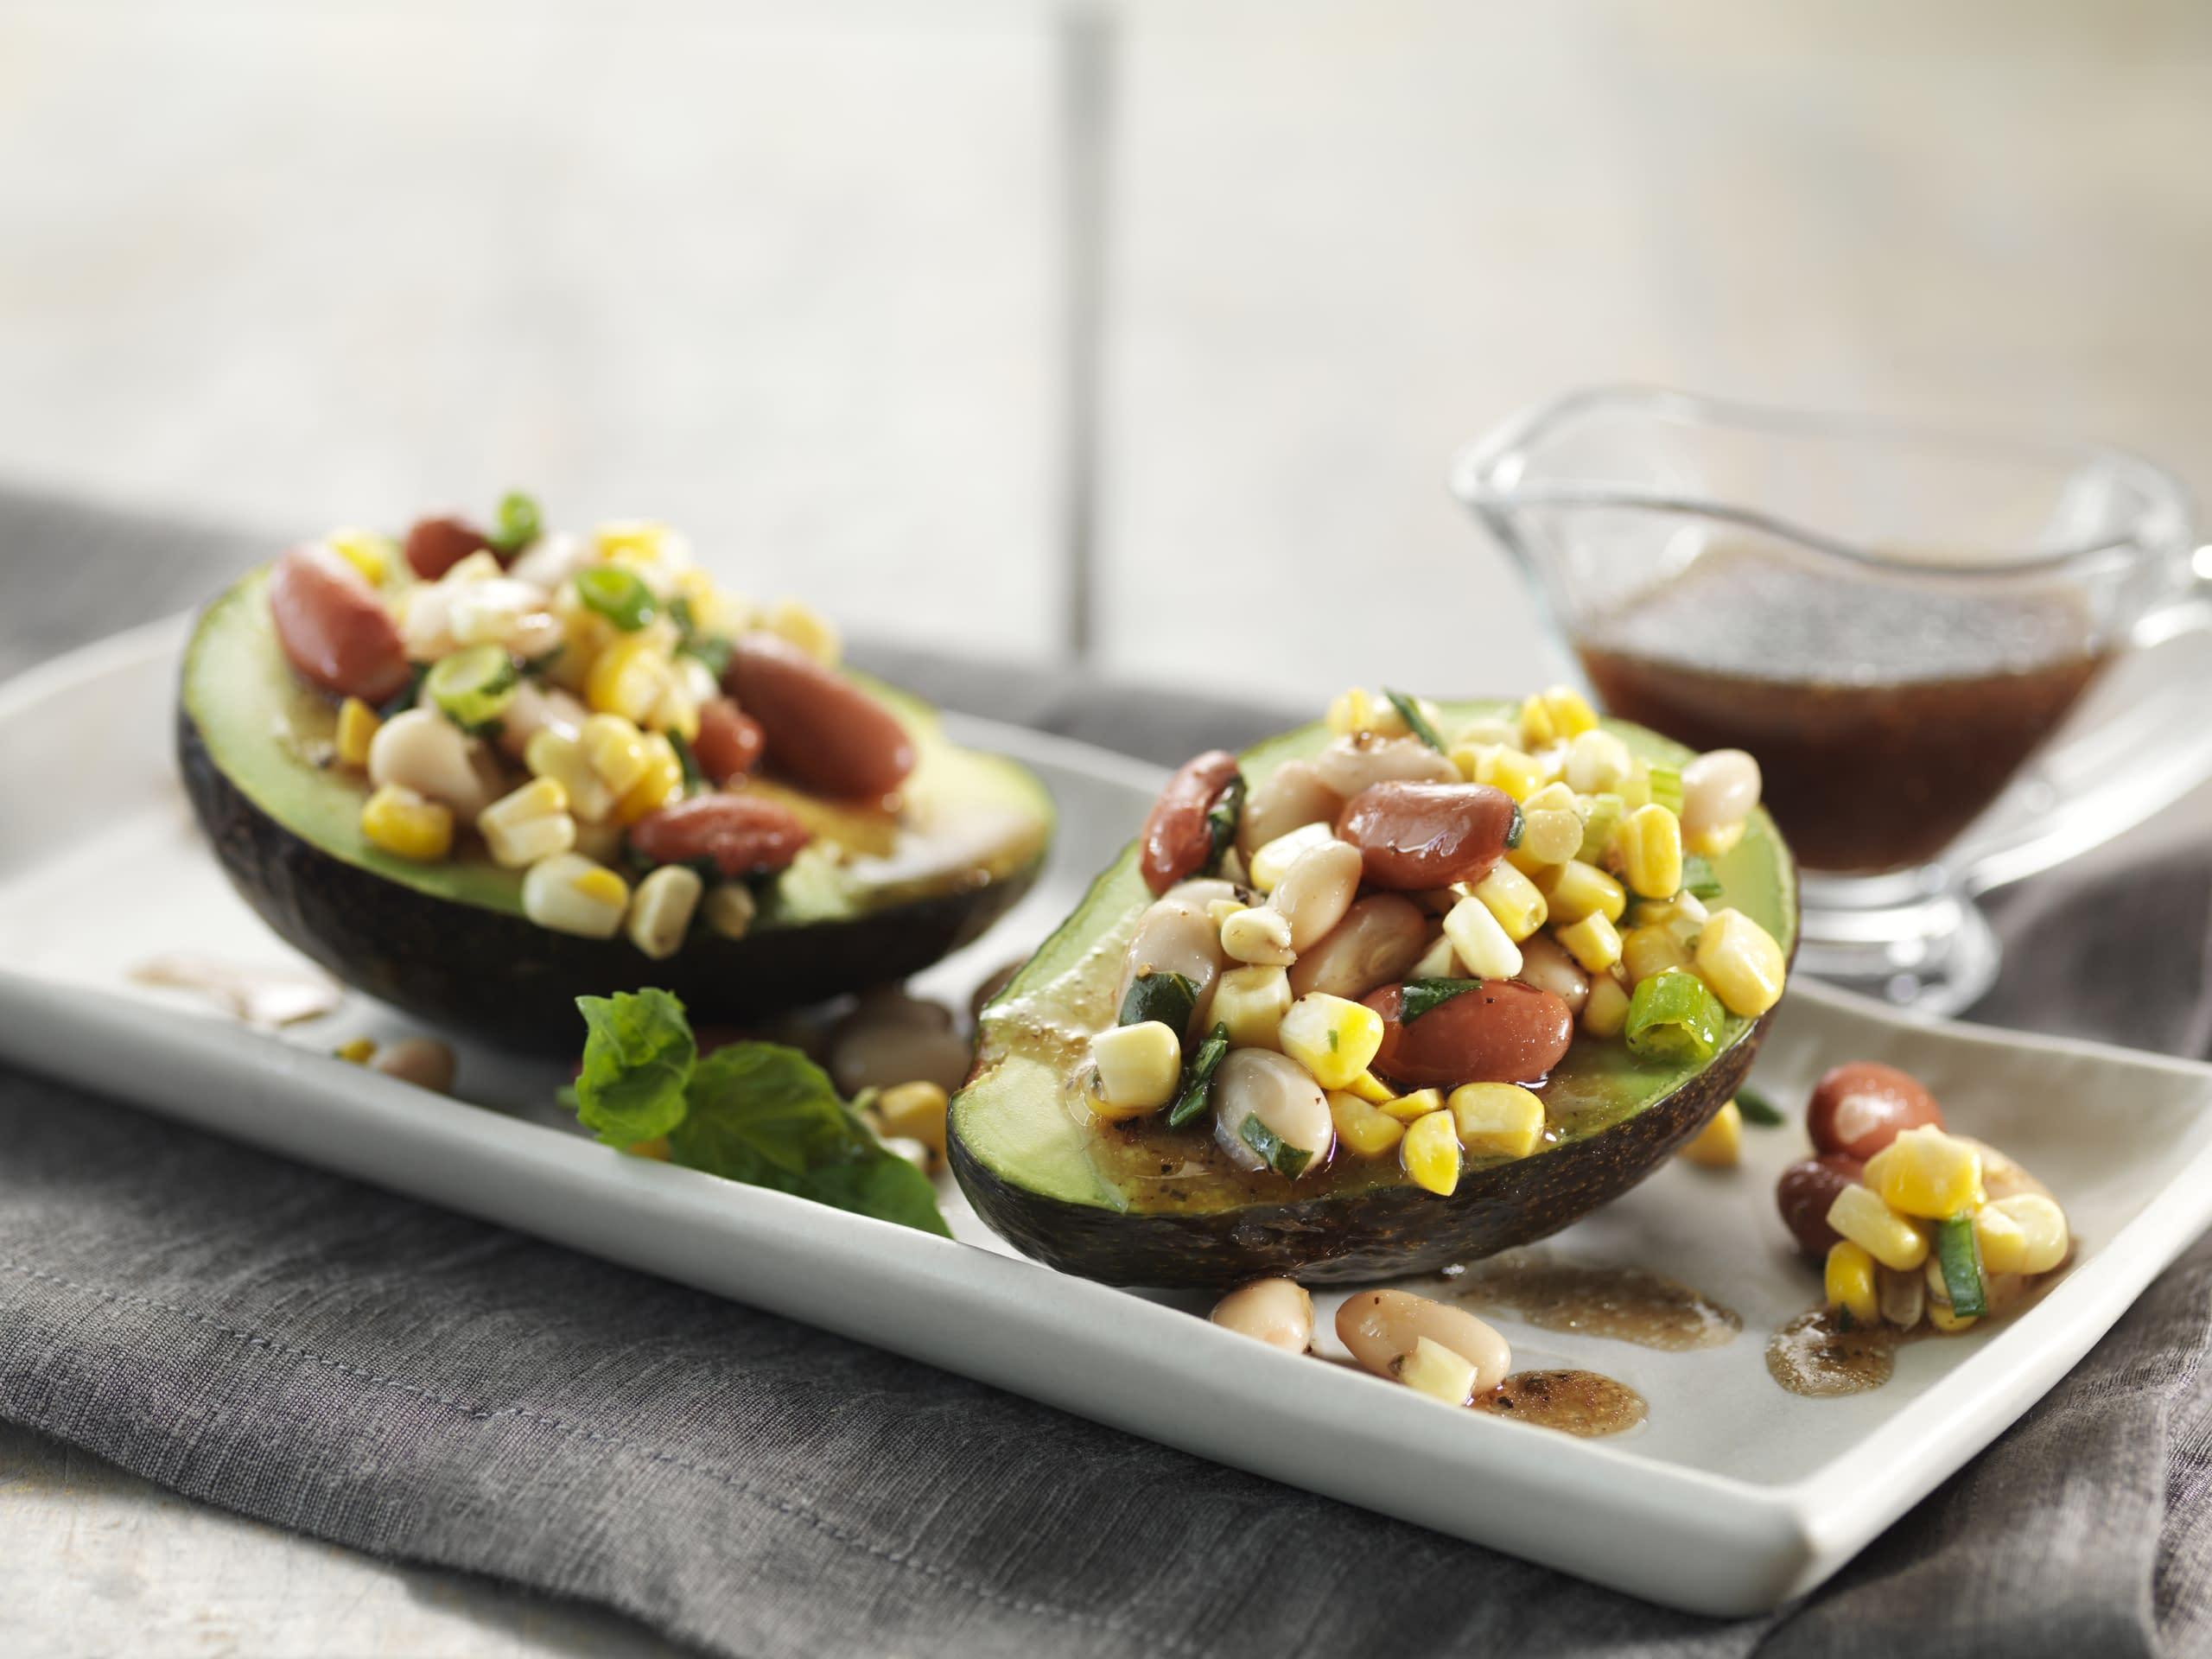 Avocado Corn Amp Bean Salad Meal Idea Panera At Home